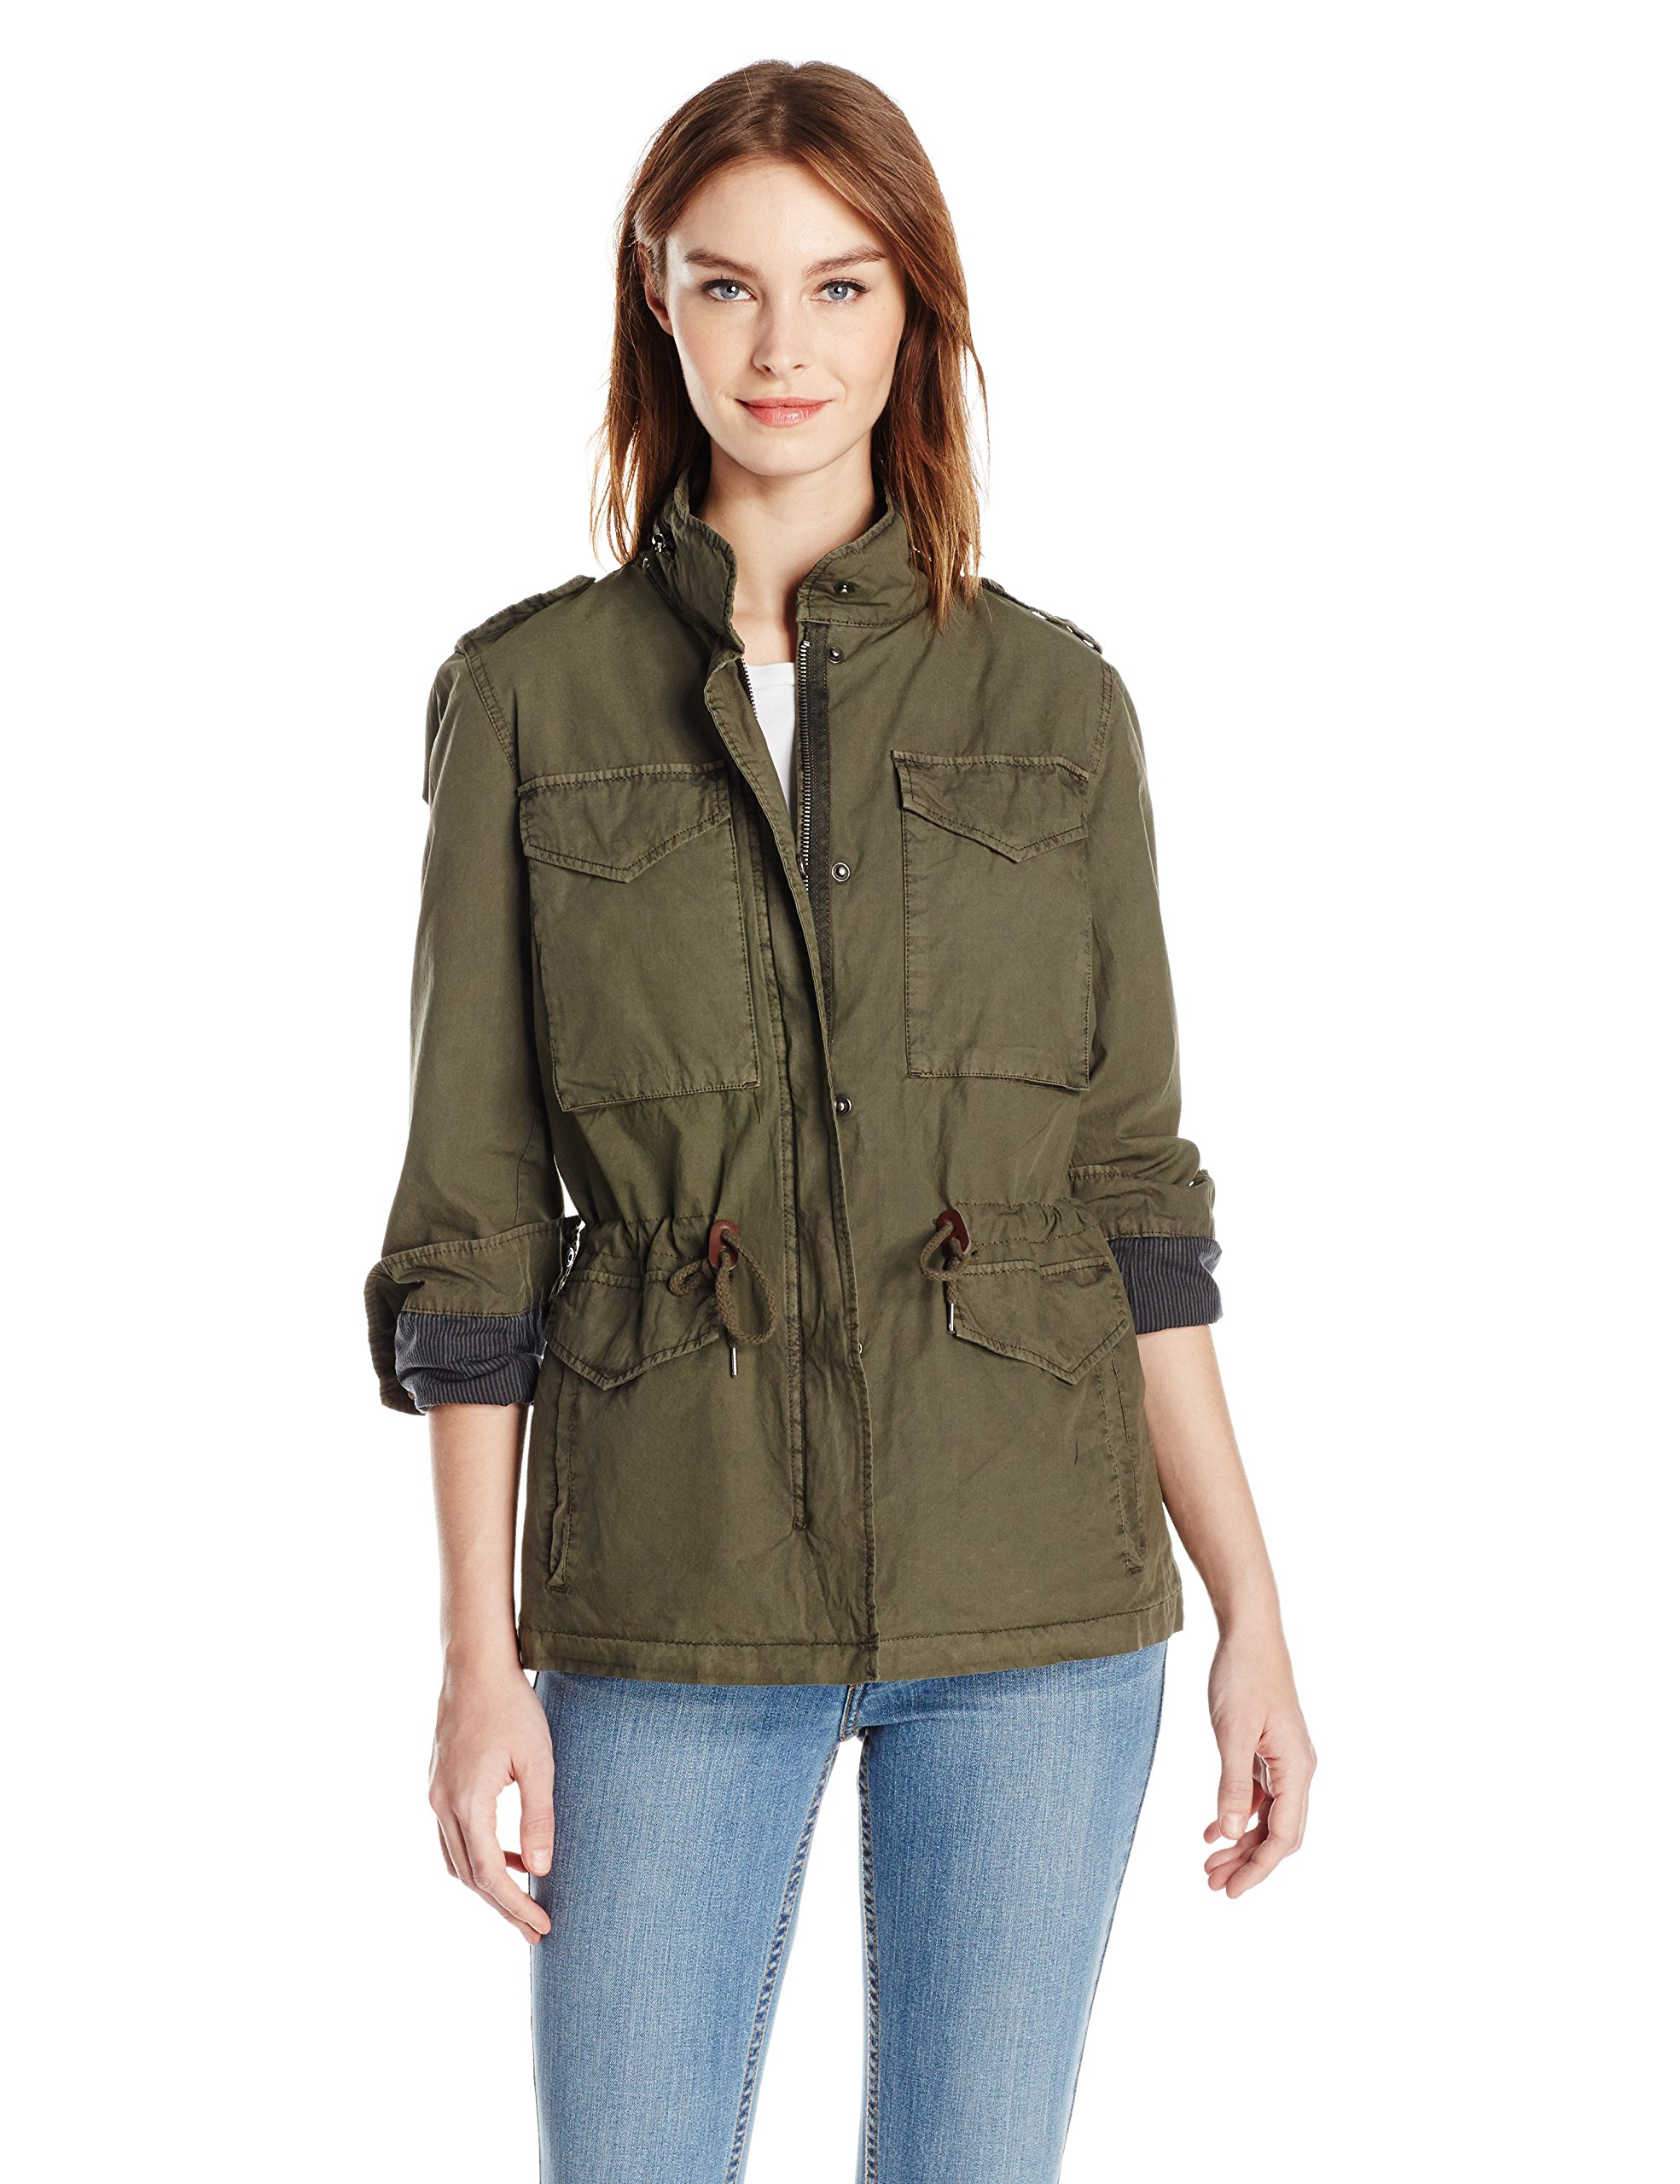 Levi's Women's Lightweight Cotton Four Pocket Field Jacket, AGN, S